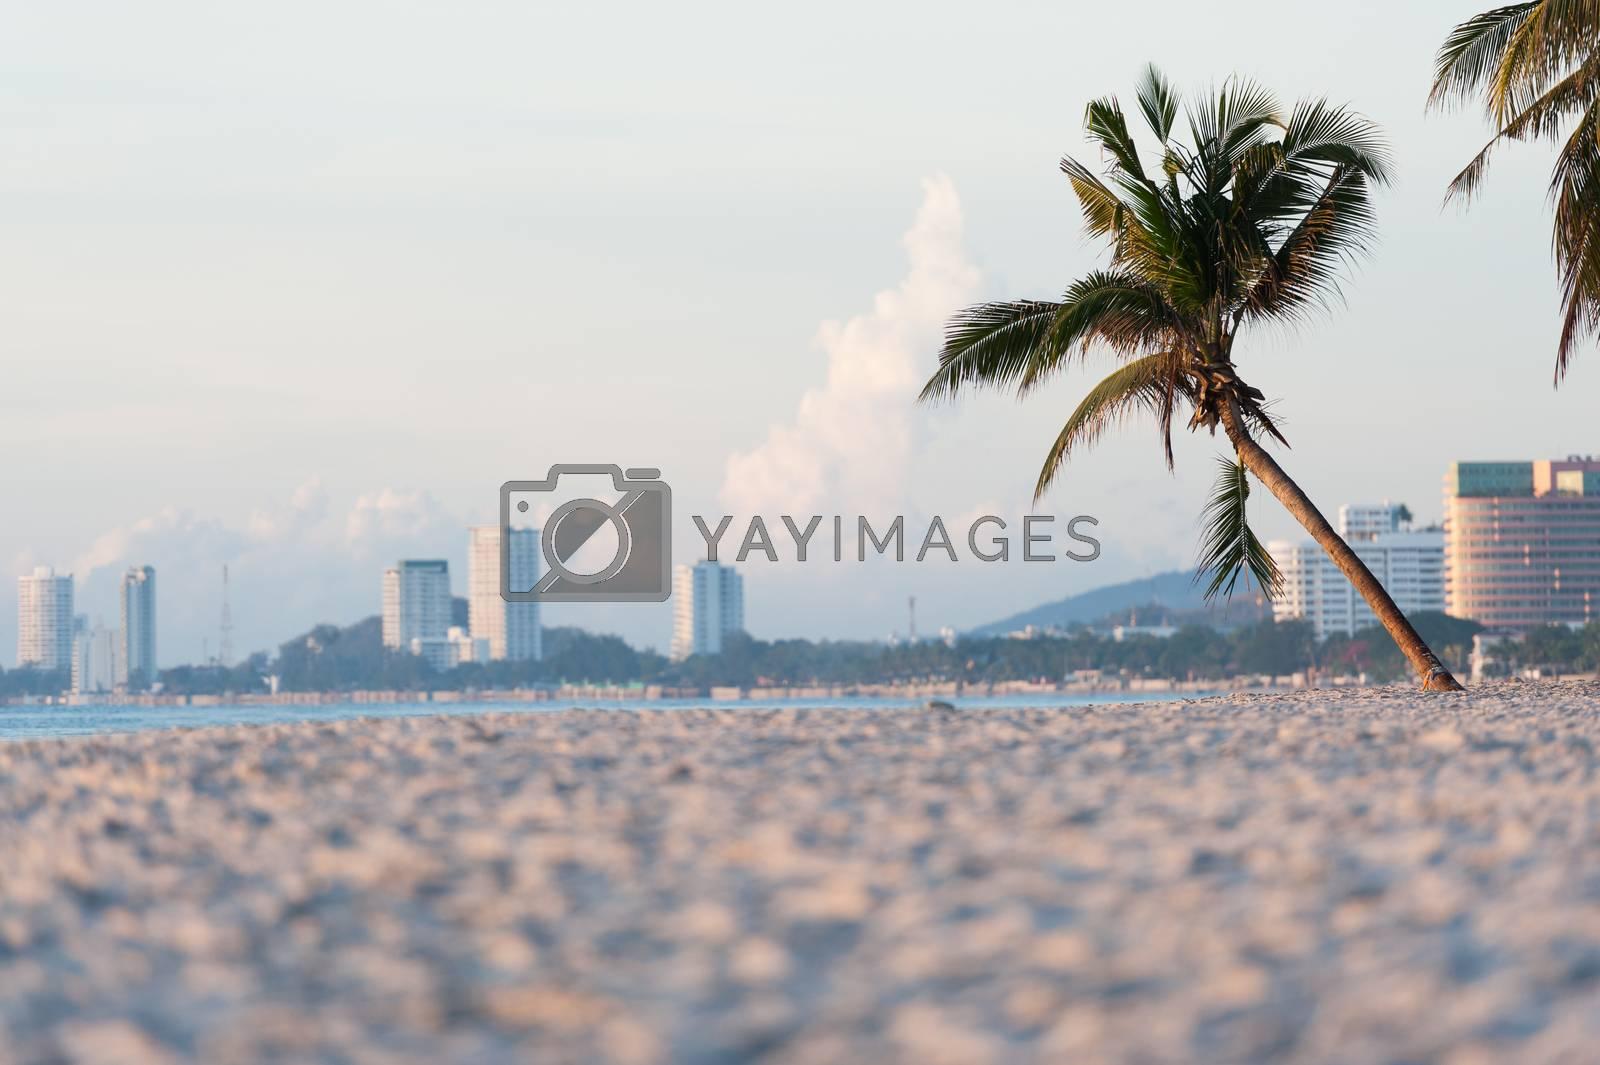 Plam tree on the beach by Surasak